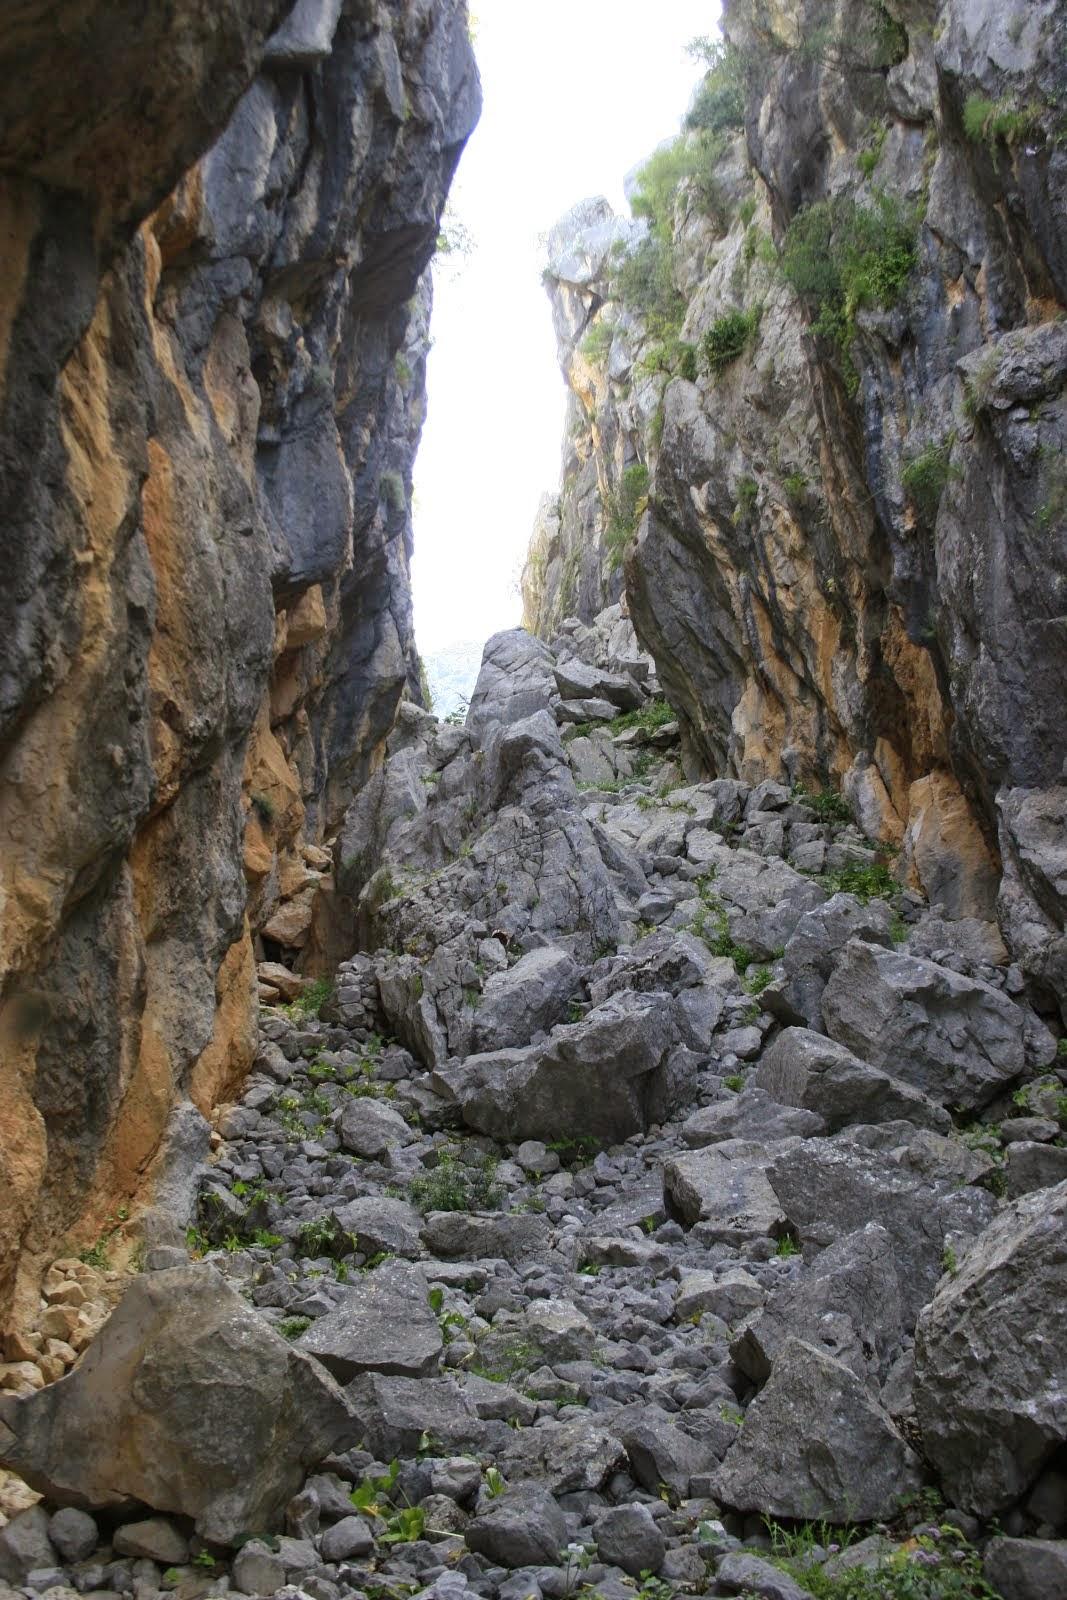 Sierra de Ubrique